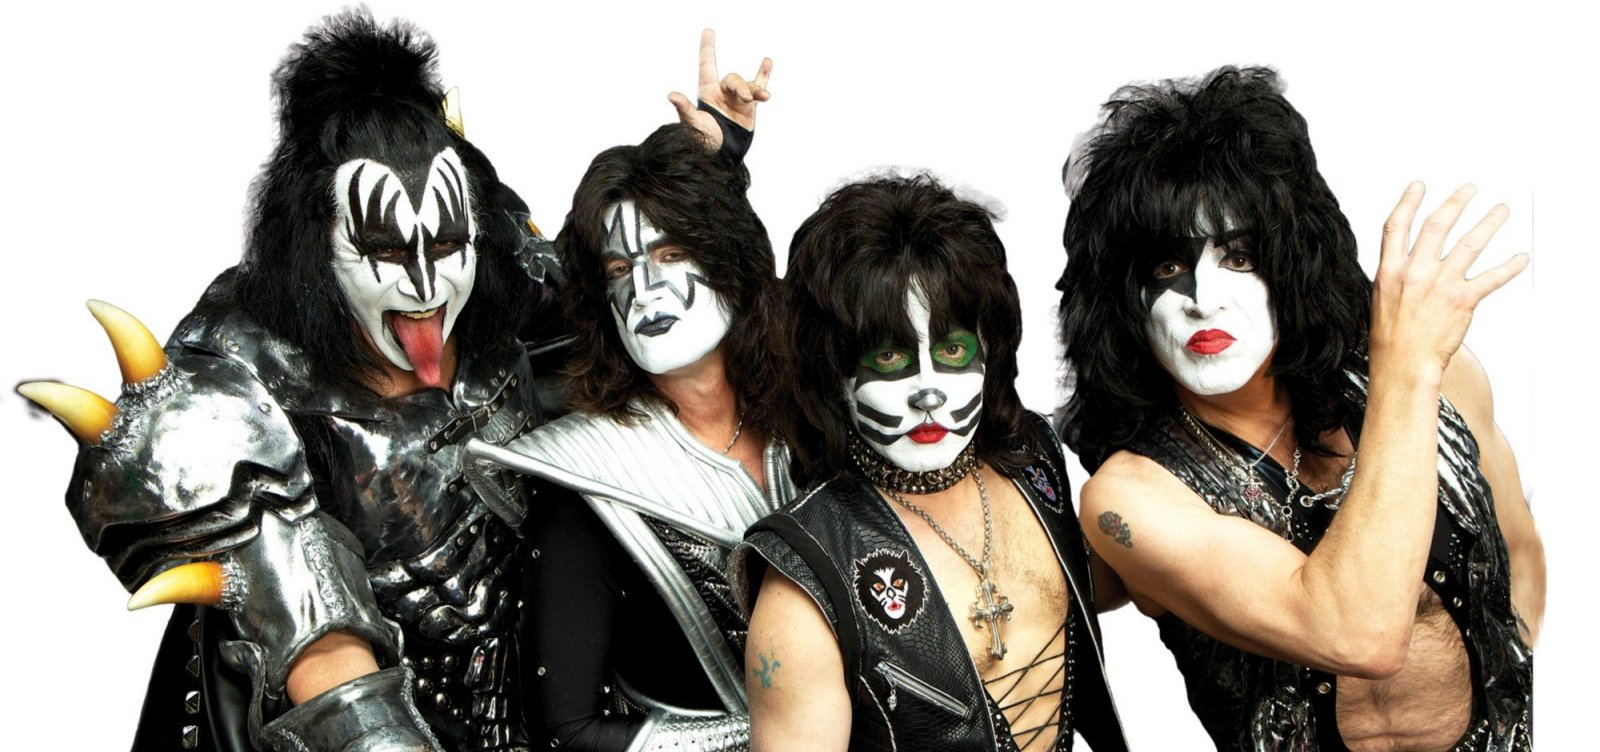 [Kiss anuncia turnê de despedida: 'Queremos parar no auge']